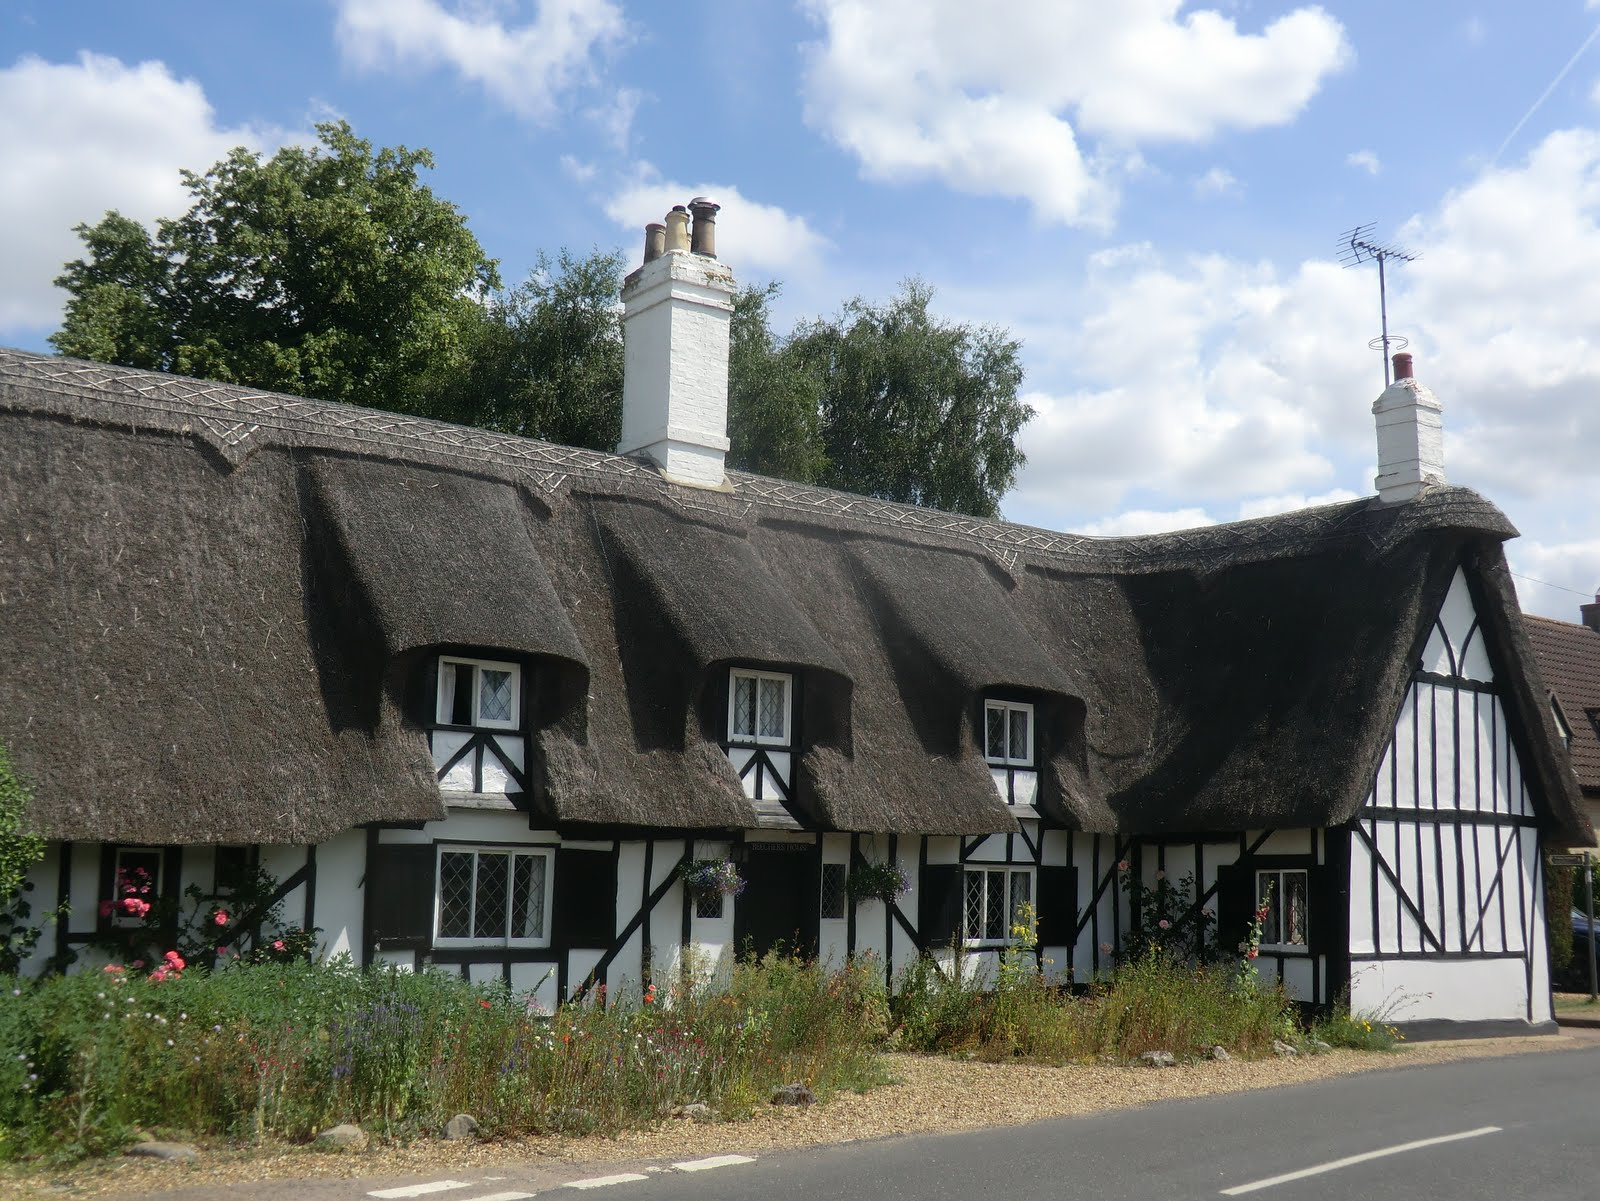 CIMG8917 Cottage, Hemingford Abbots